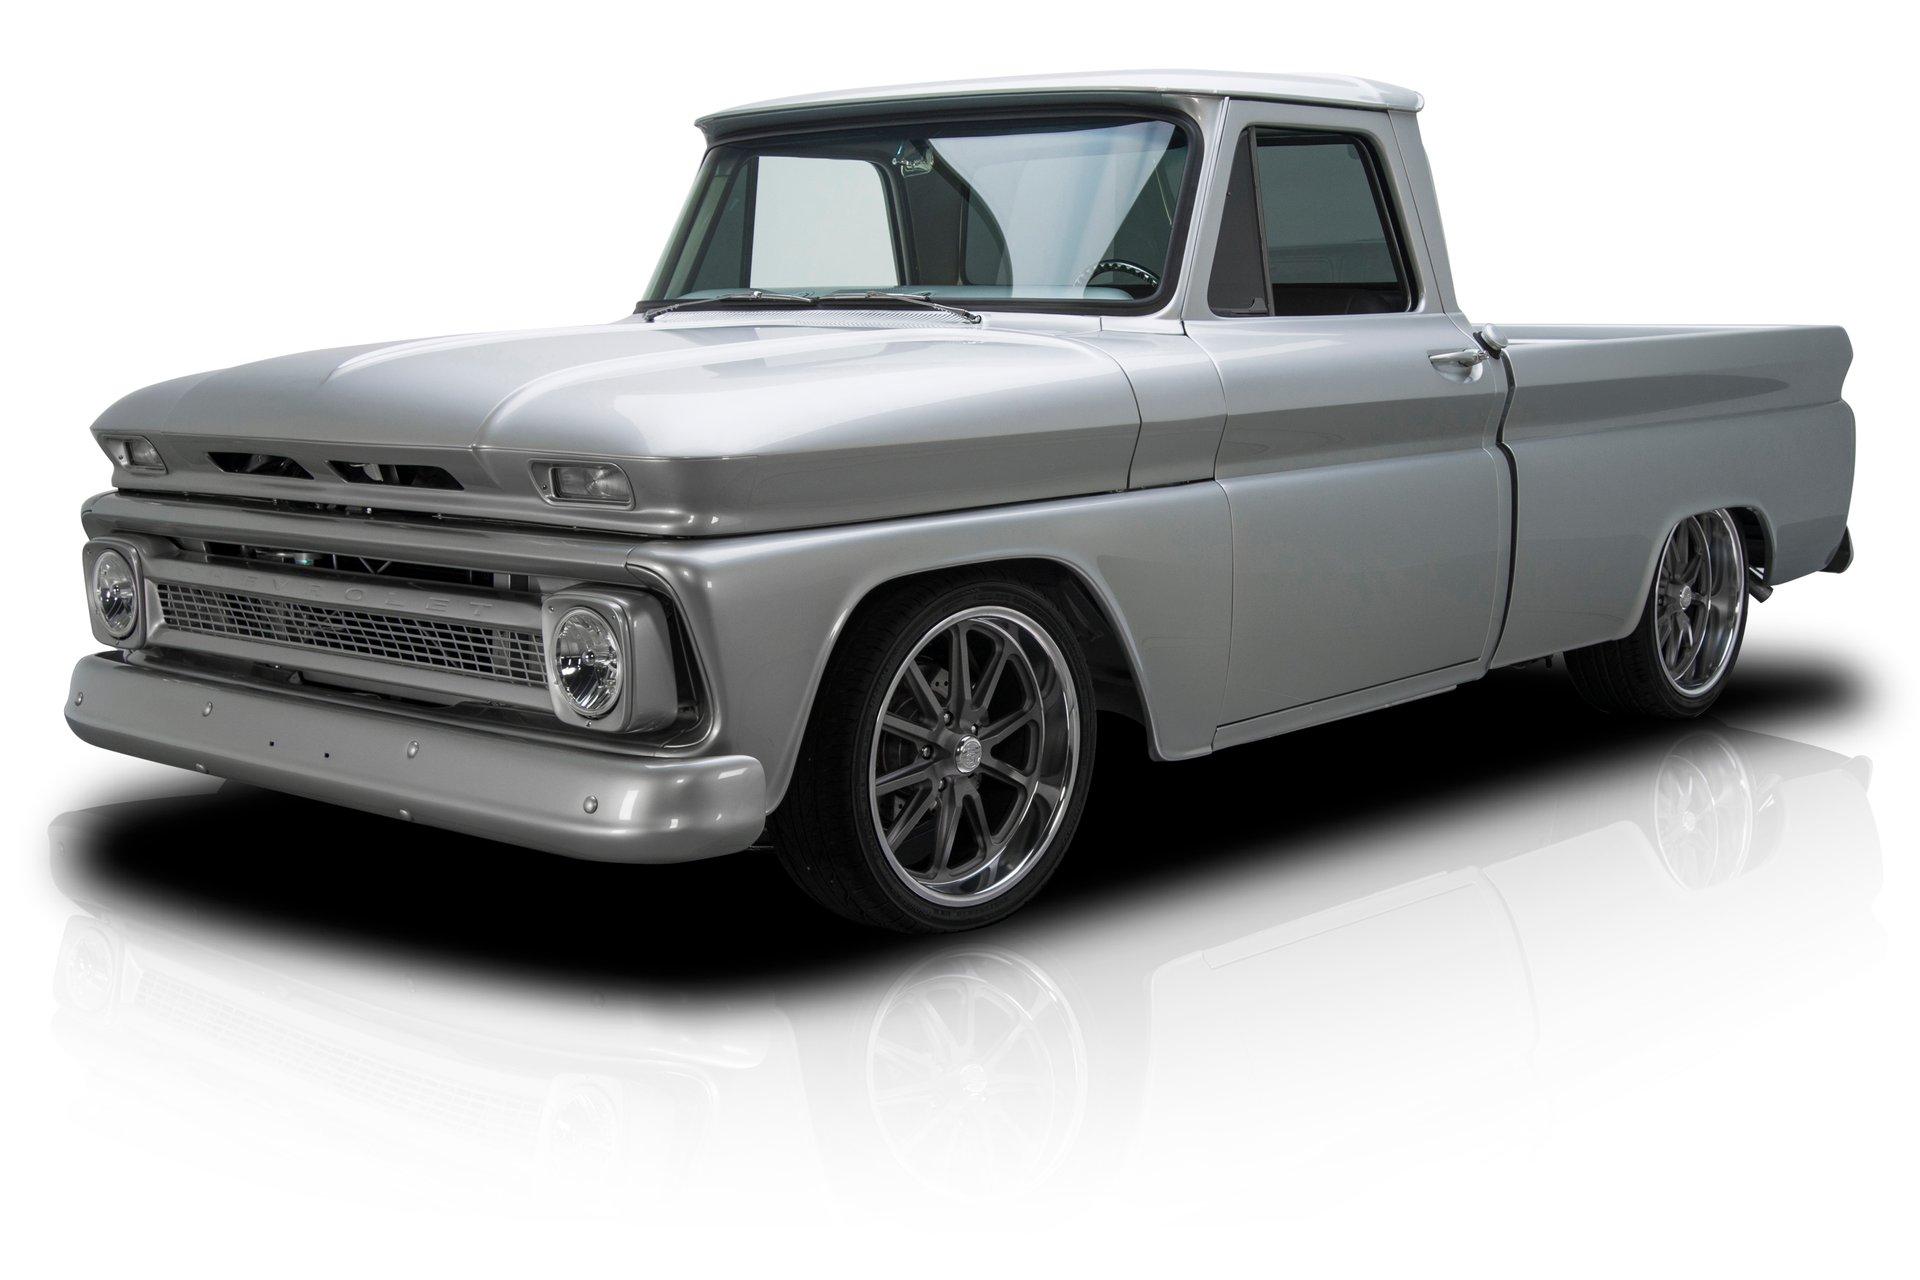 1965 chevrolet c10 apache pickup truck